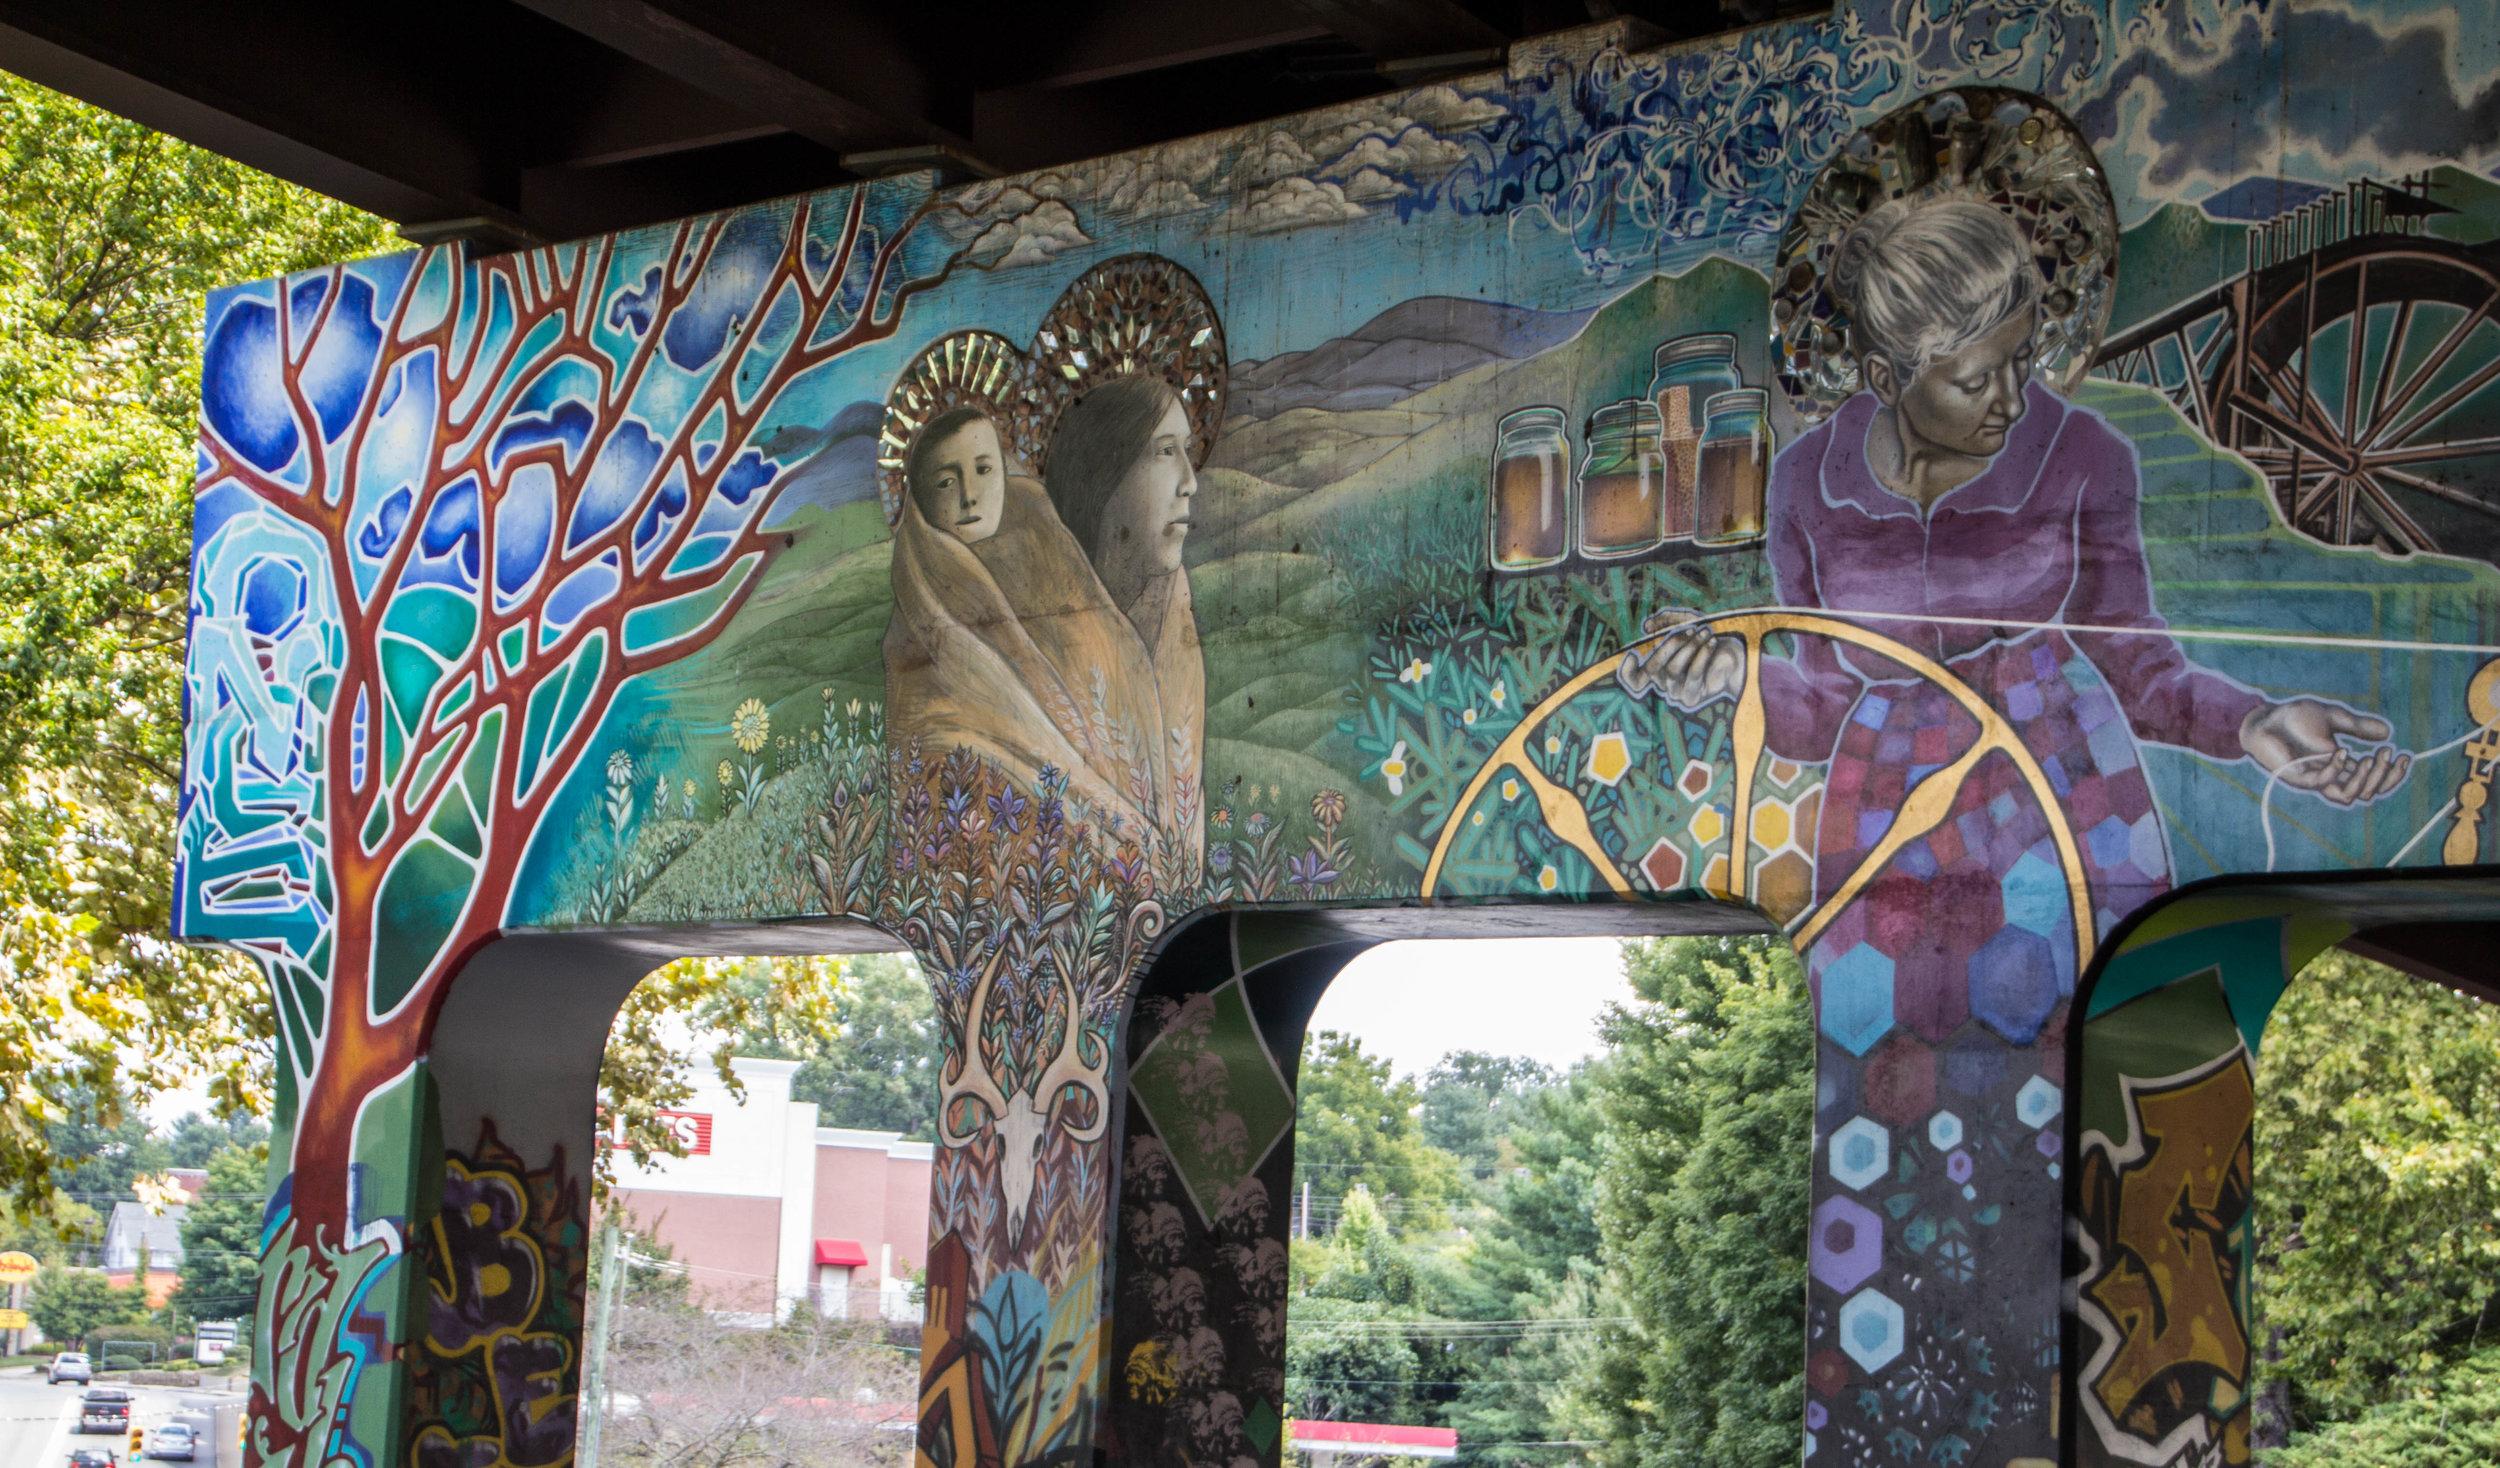 street-art-asheville-north-carolina-14.jpg